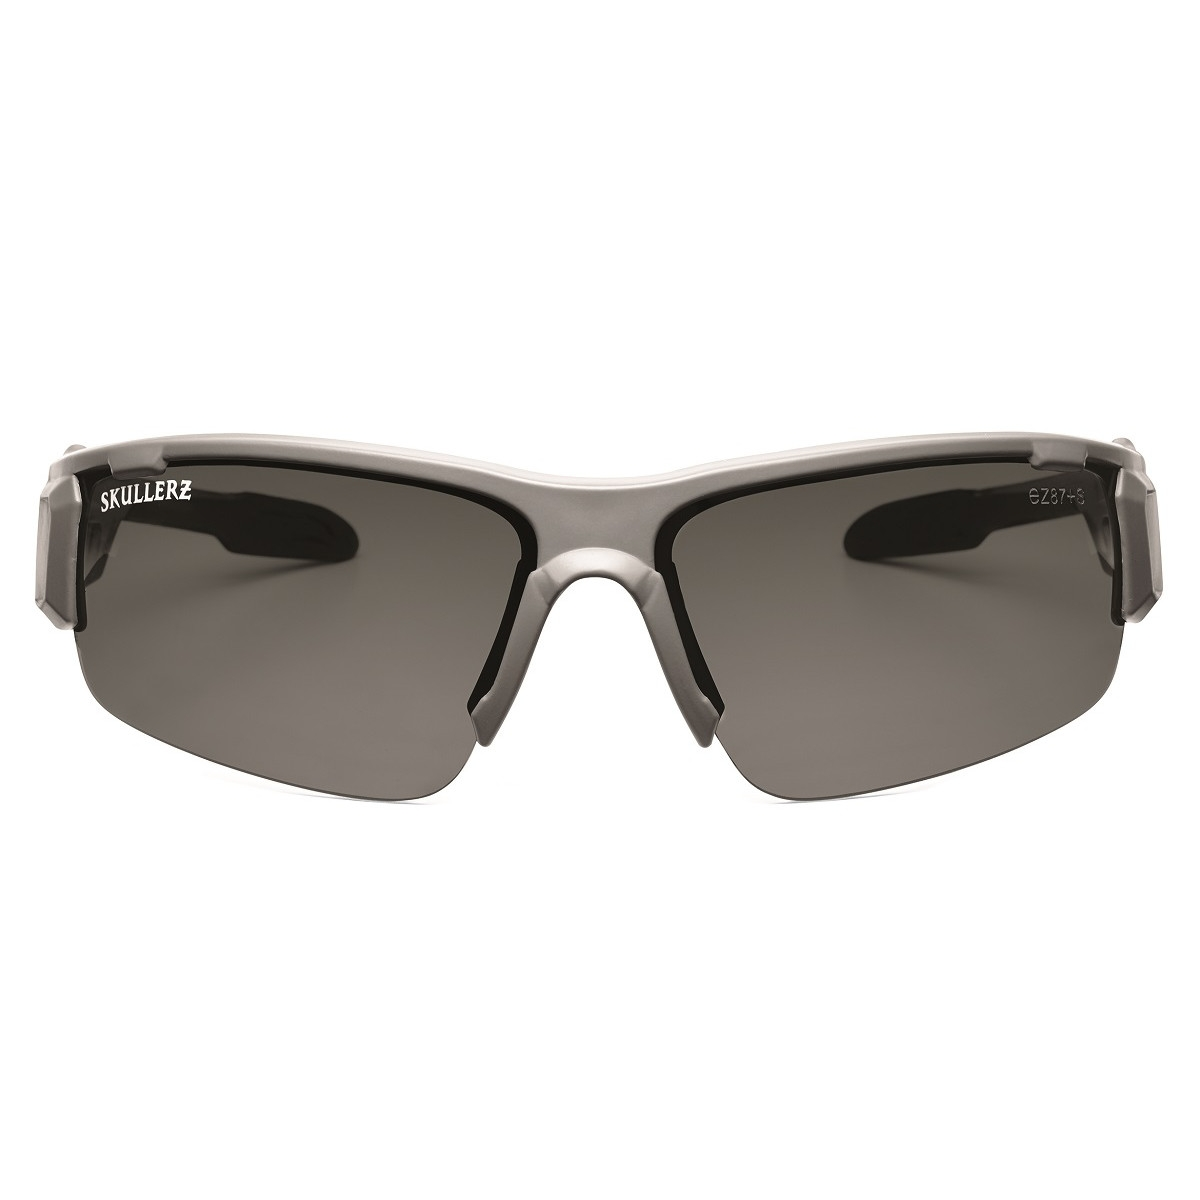 425818b9c8c Ansi Z87.1 Prescription Safety Glasses Walmart